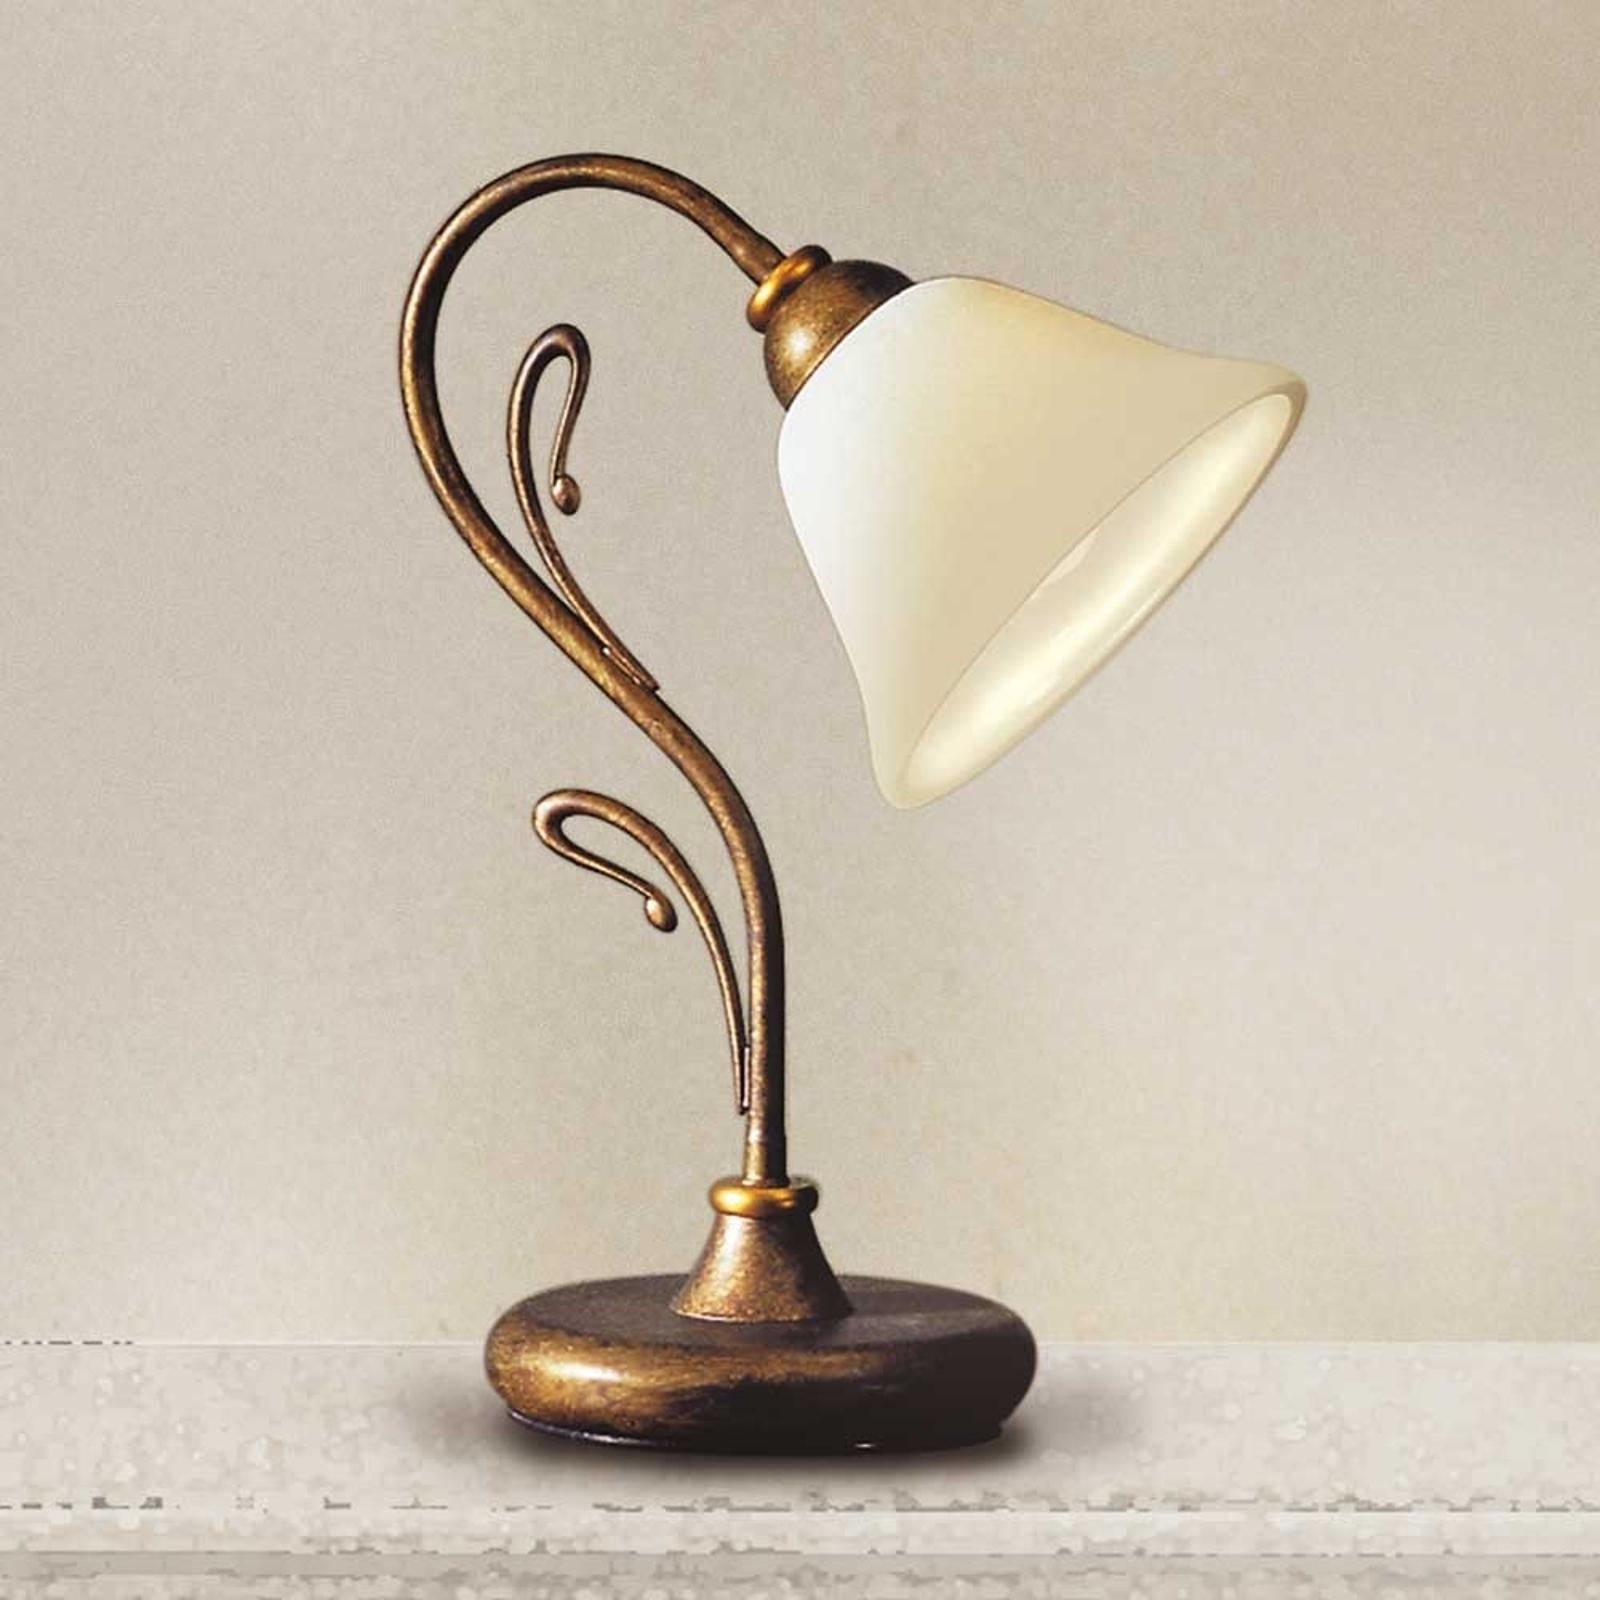 Stijlvolle tafellamp Antonio